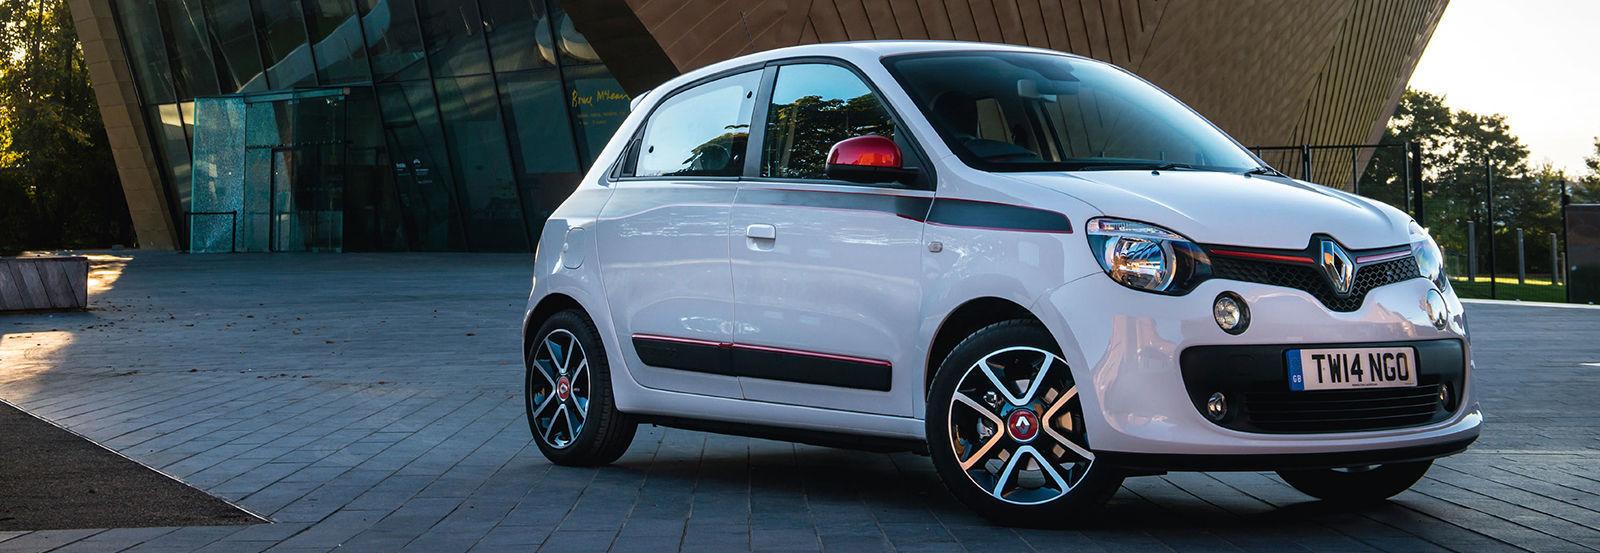 Kendall Car Hire